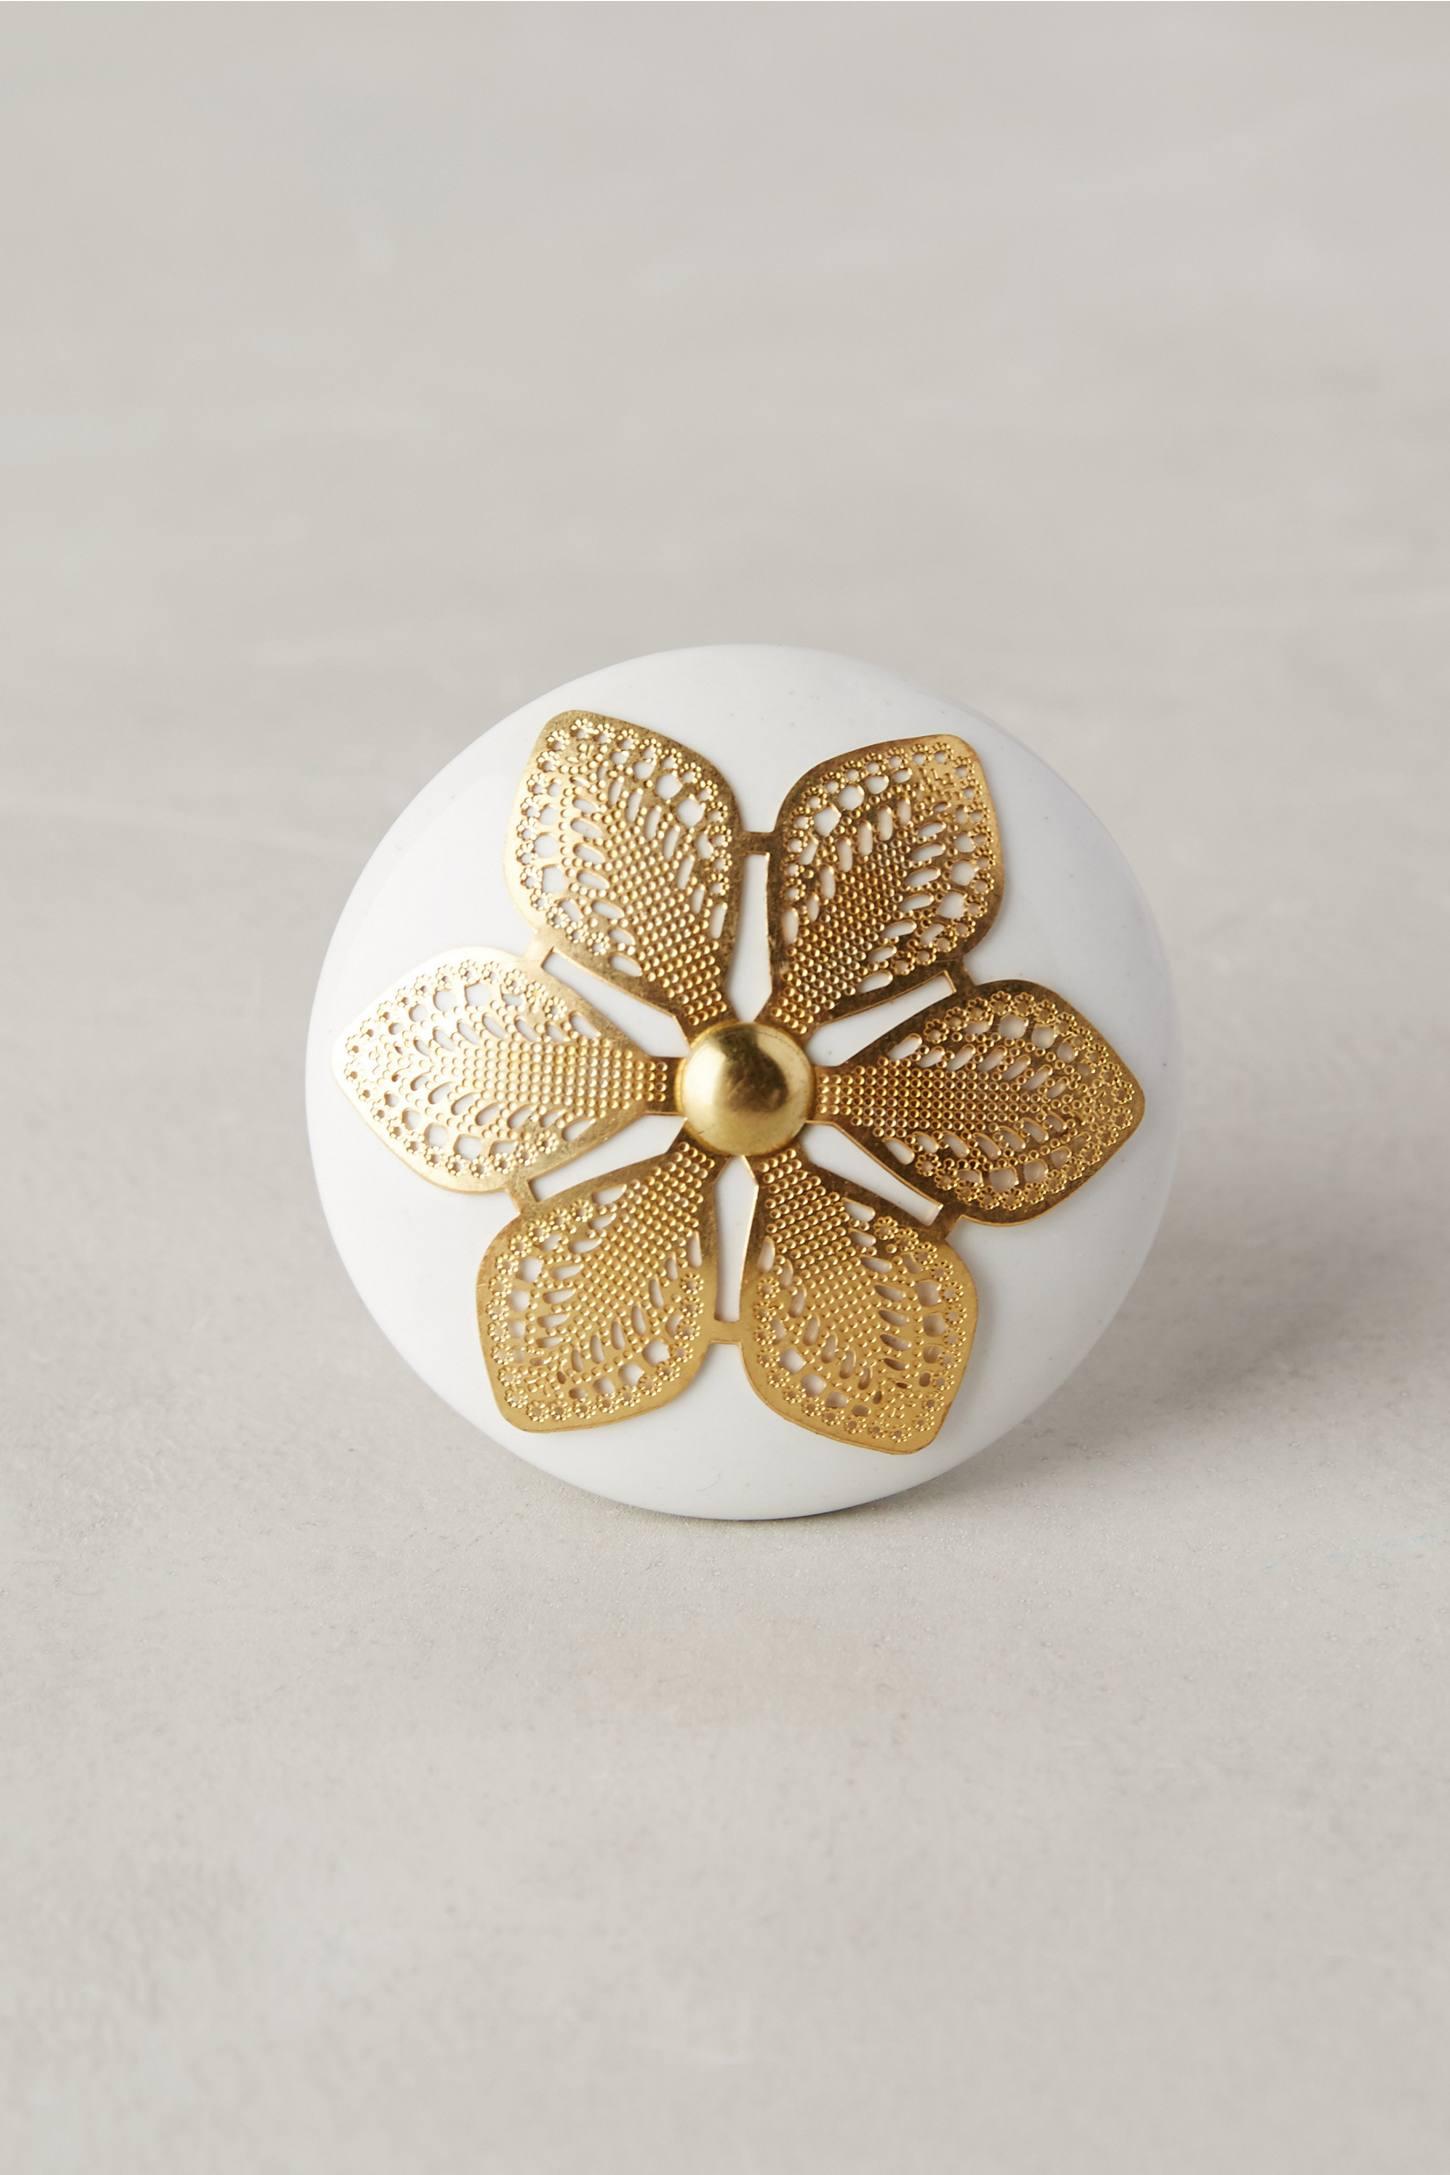 Etched Blossom Knob